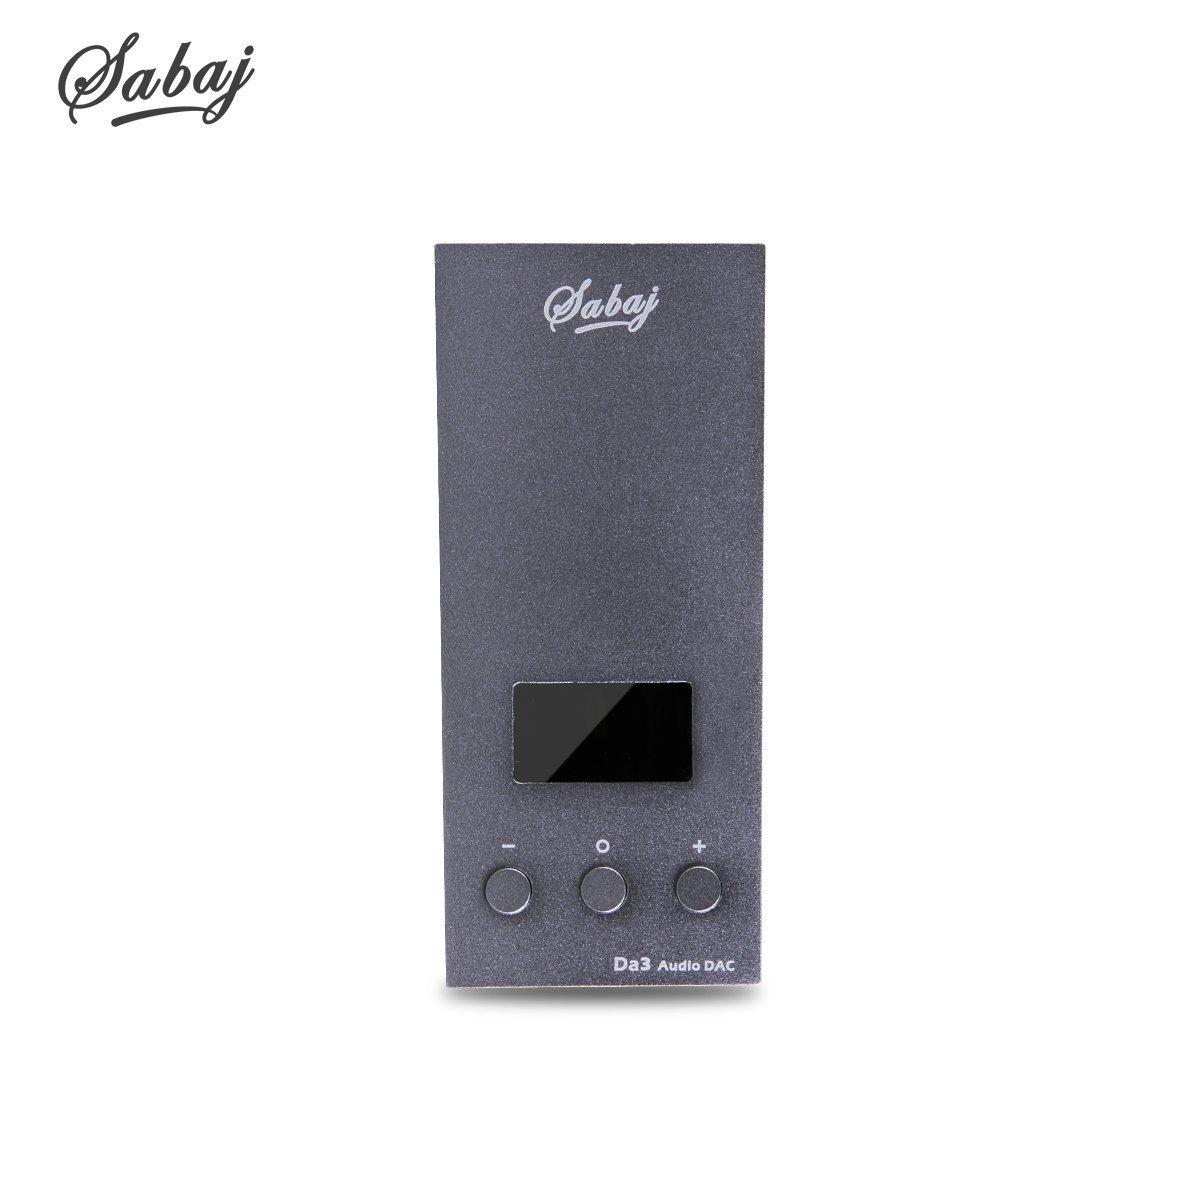 Sabaj Da3 Headphone Amplifier Mini Portable High Resolution Amplifiers Hi-Res USB Amp&DAC DAC Native DSD512 32bit/768kHz Dual DAC (Gray) SHENZHEN DAHAO Technology Co. ltd DA3-Grey